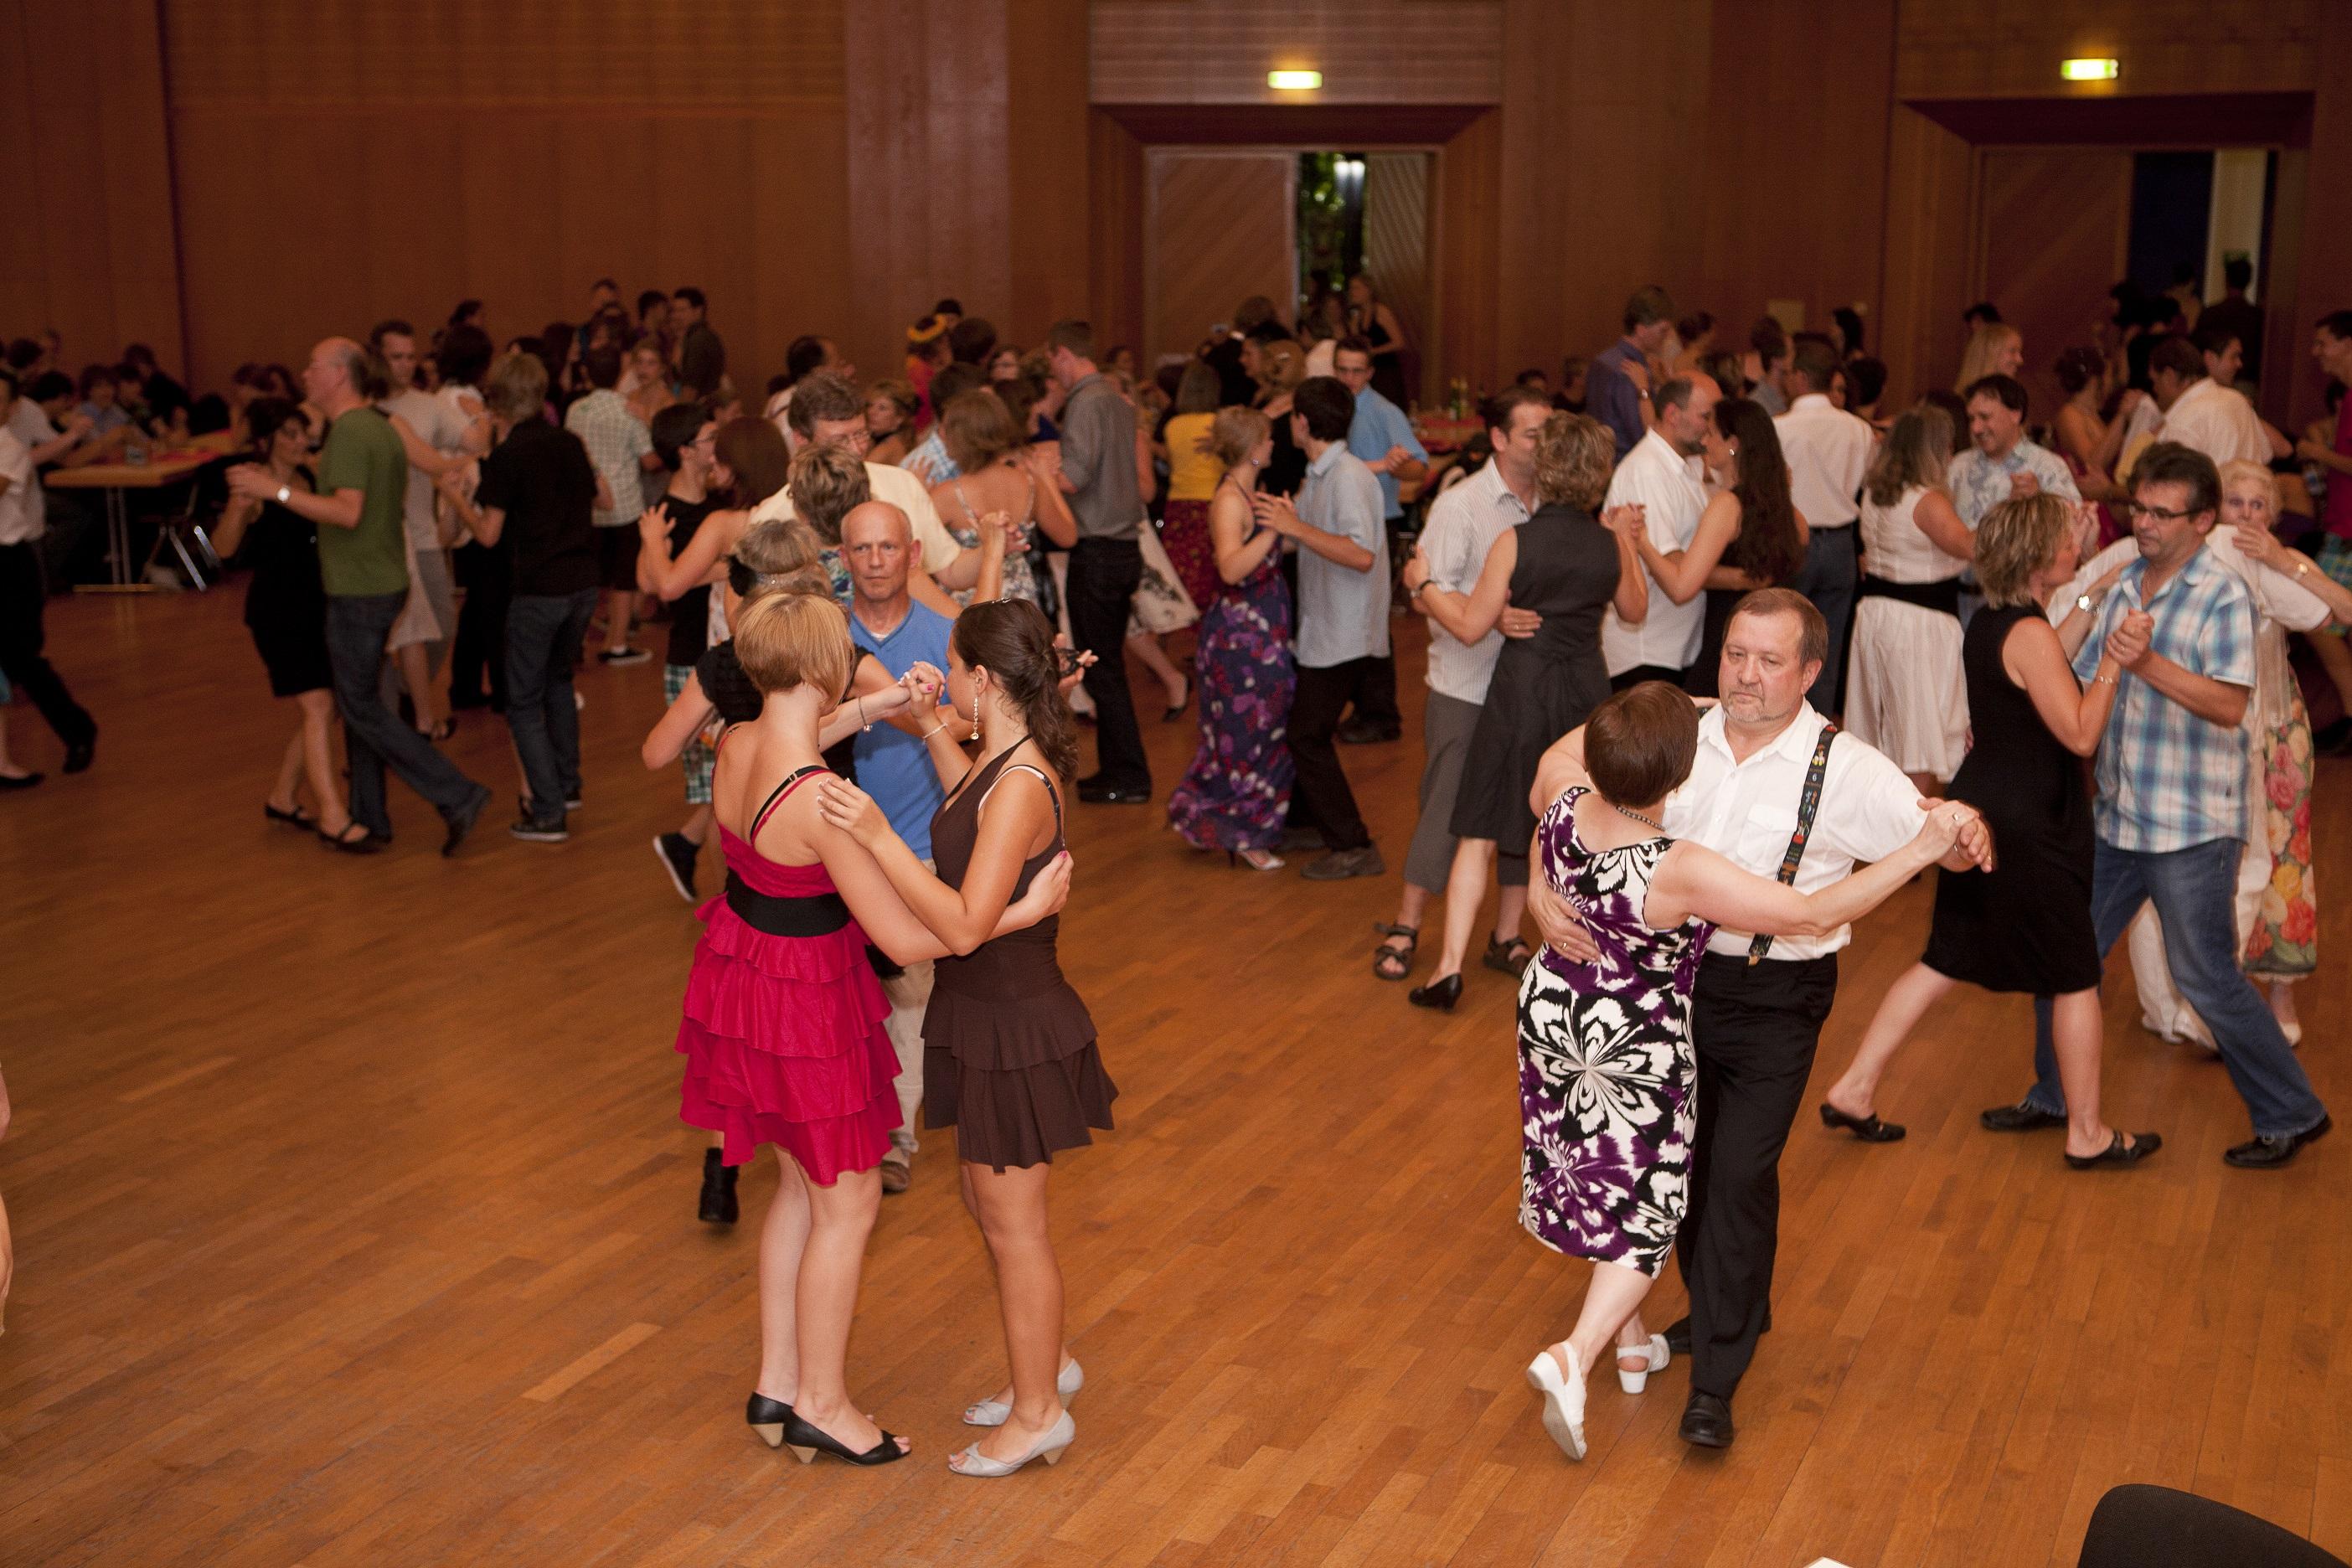 Tanzkurse für singles in graz